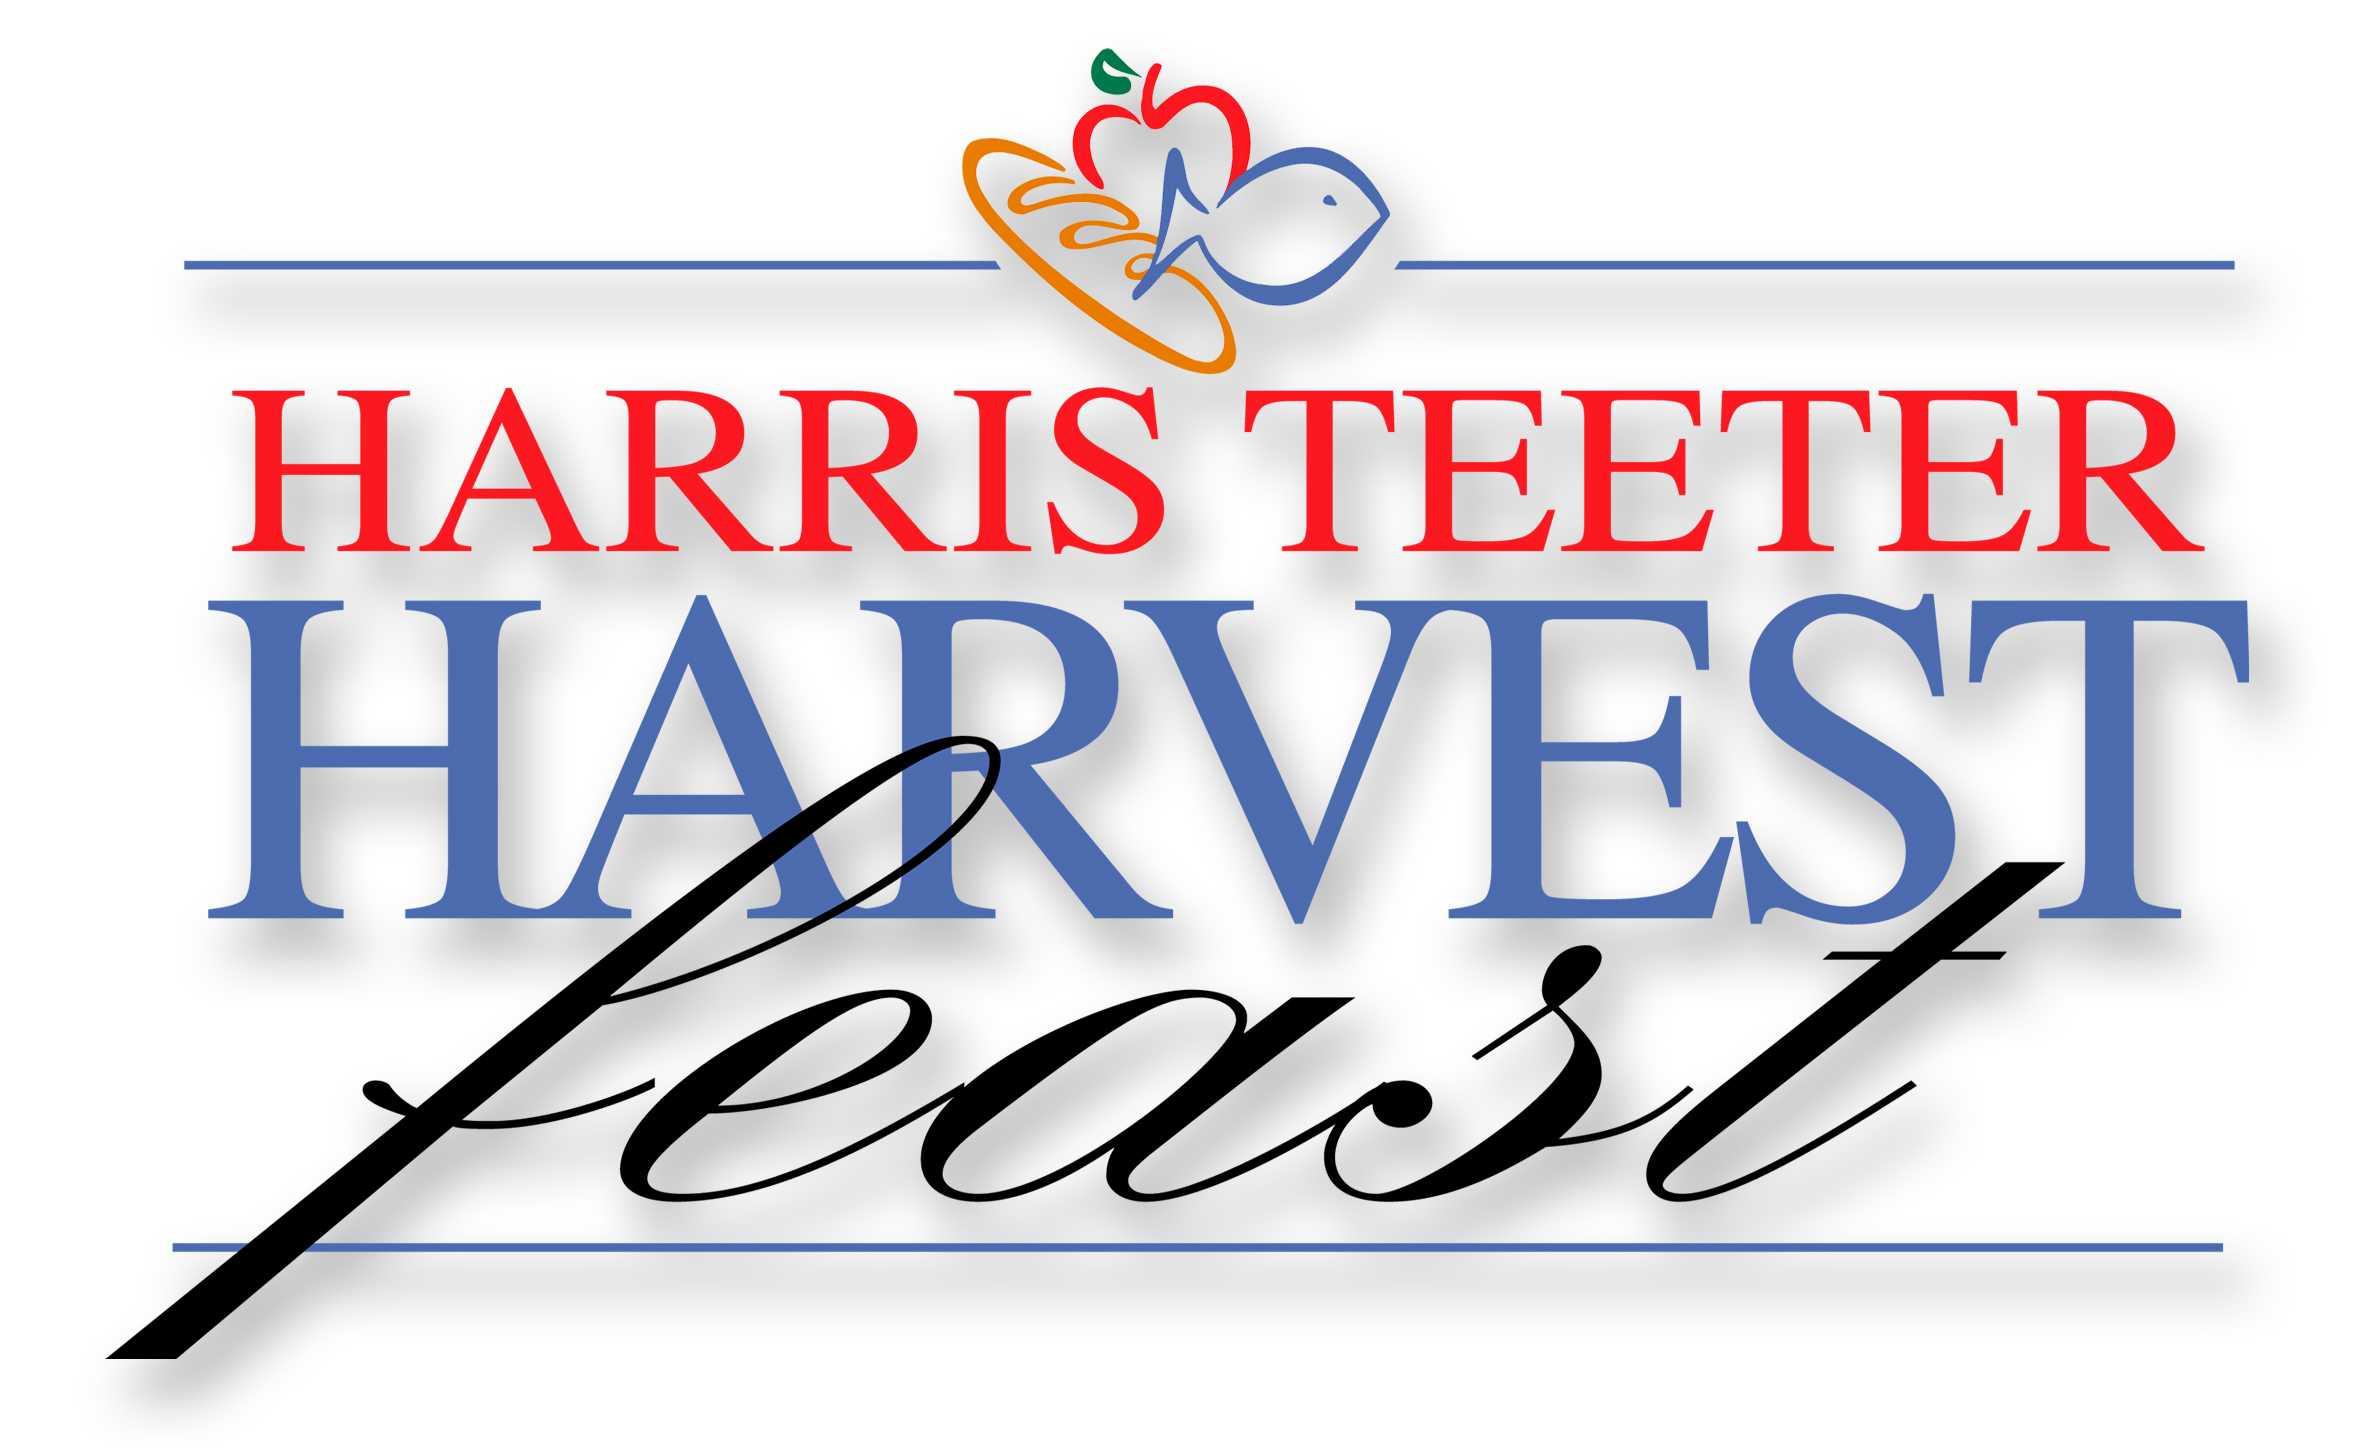 Harris Teeter Thanksgiving Dinner  Harris Teeter Second Harvest to Assemble Harvest Feast